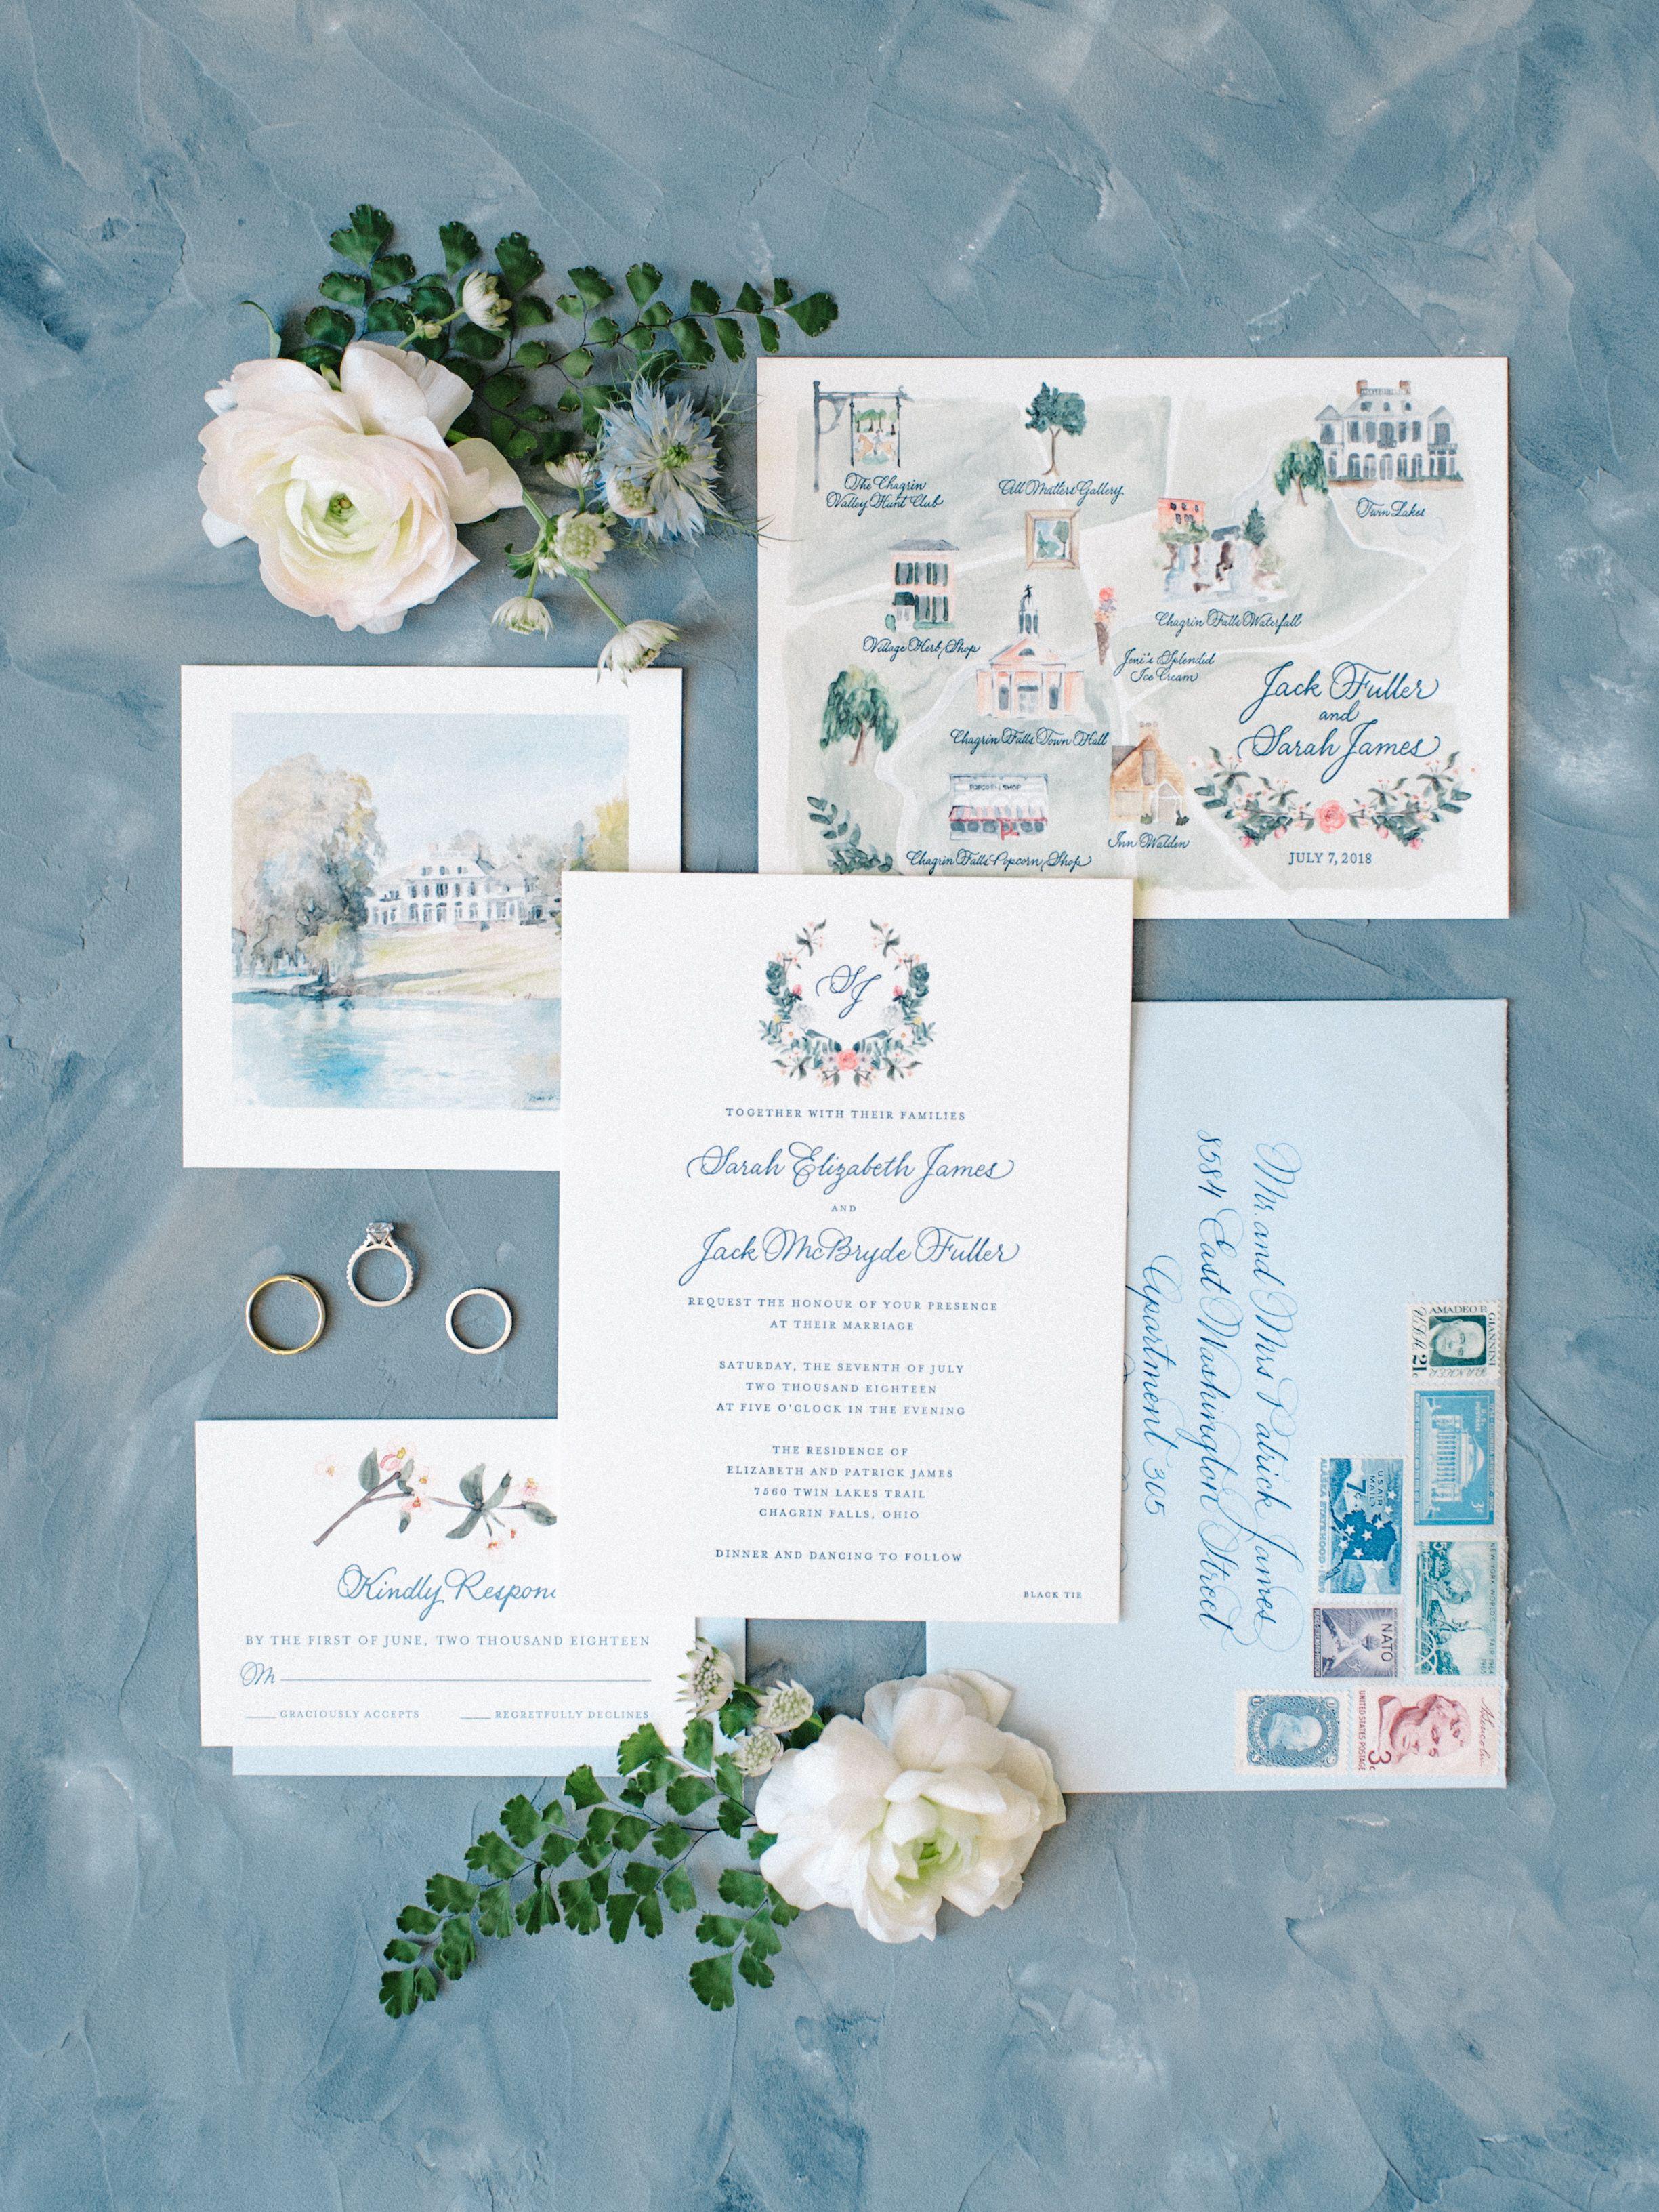 40 Elegant Wedding Invitations Ideas Marriage Invitation Card Designs